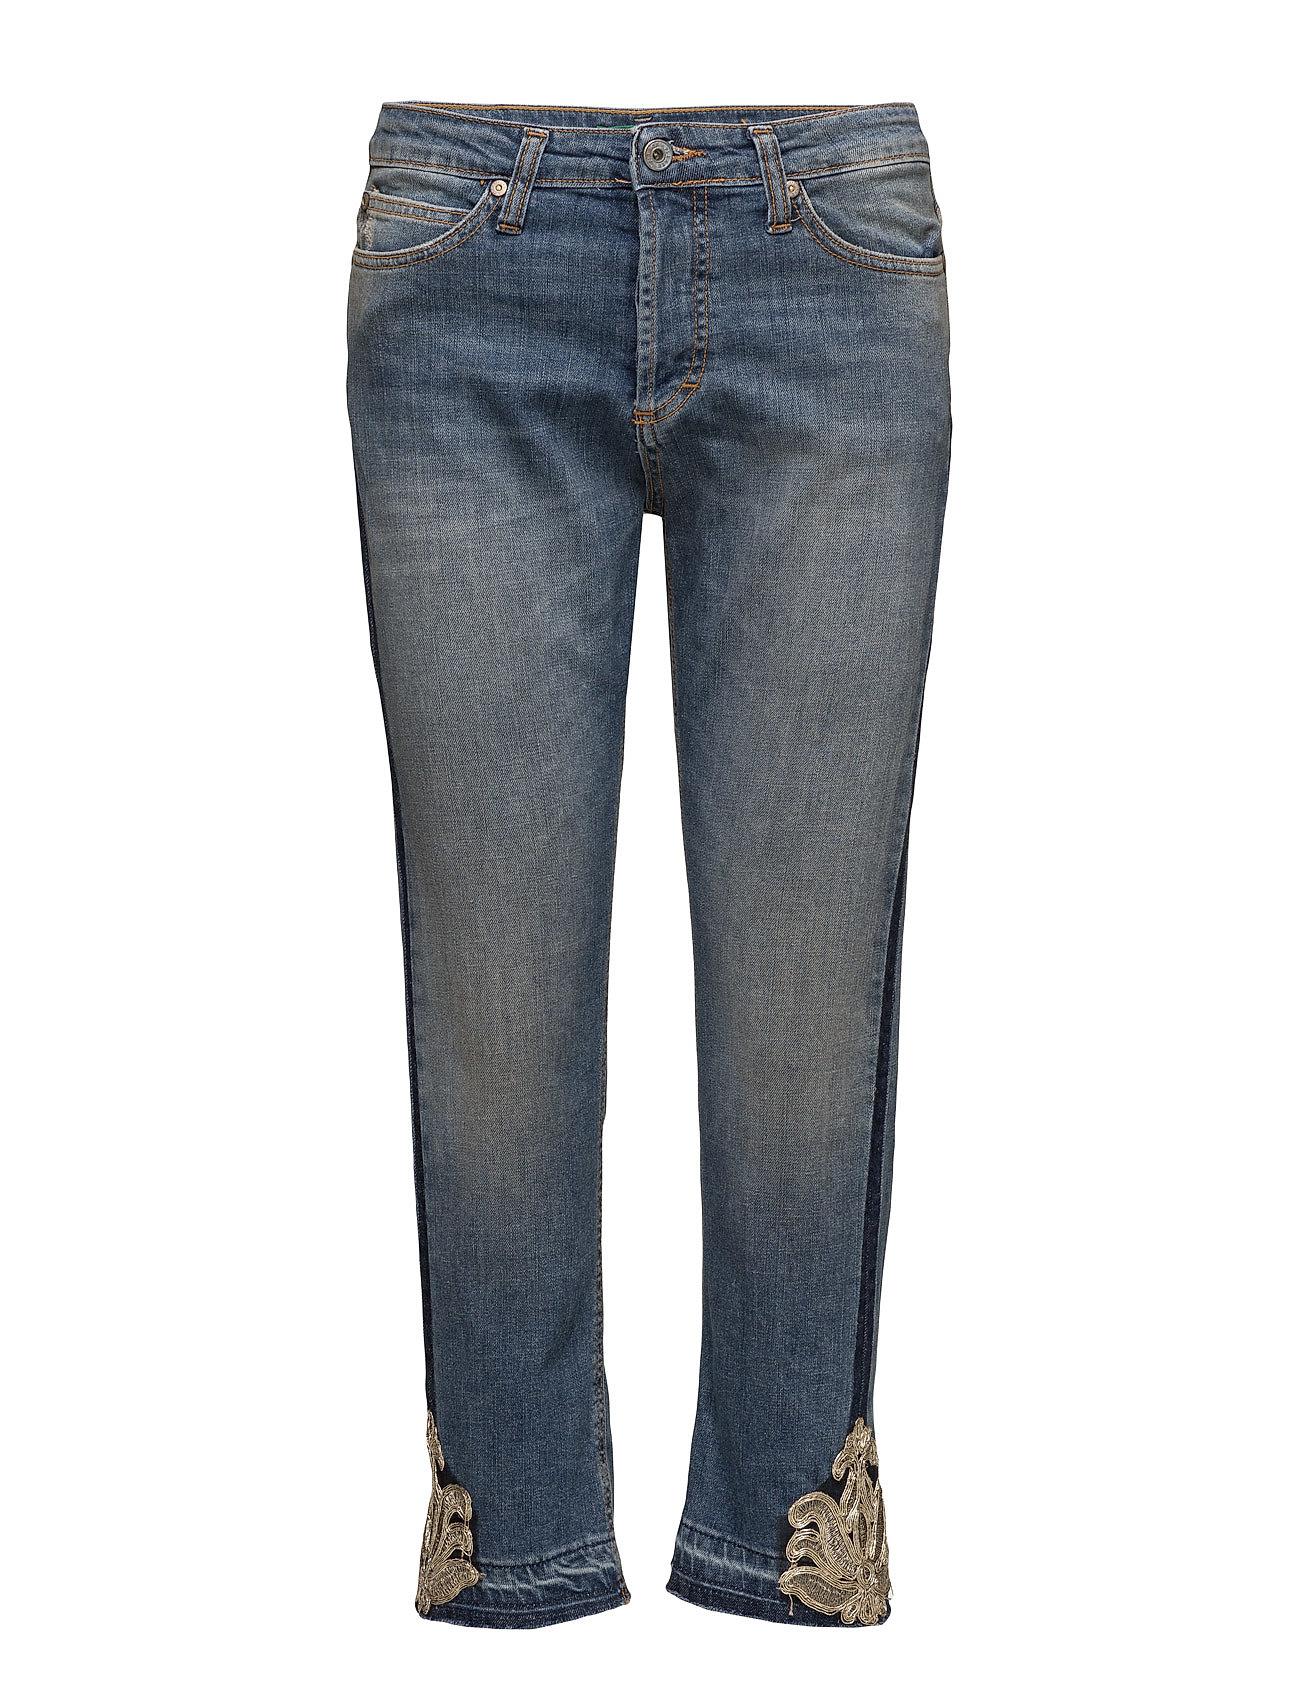 fc54adc0f5d Bestil Straight Pml Denim Please Jeans Jeans i Blå til Kvinder fra Boozt.dk